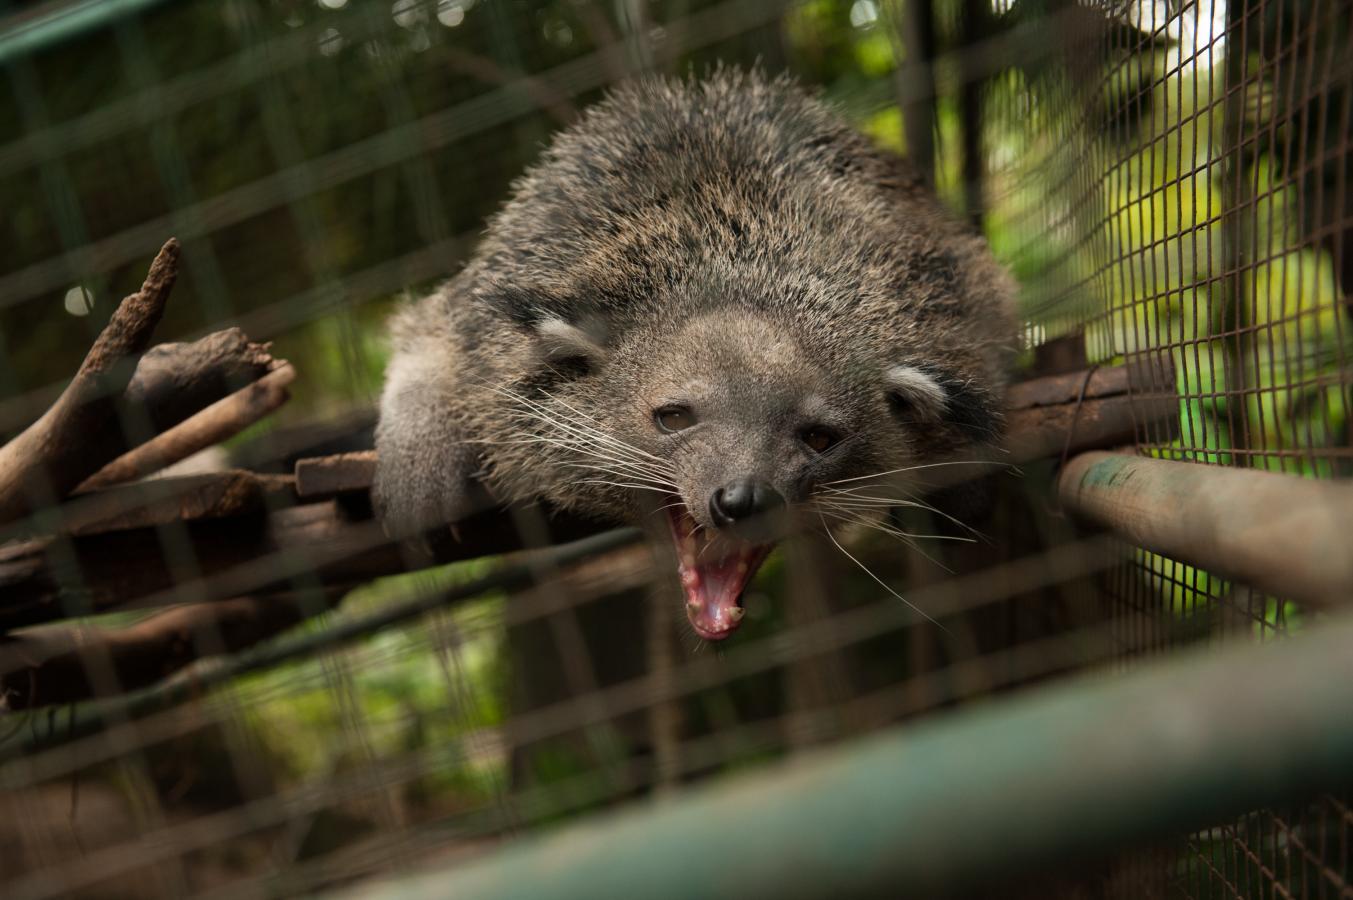 binturong-bali-zoo-singapadu-bali-2013